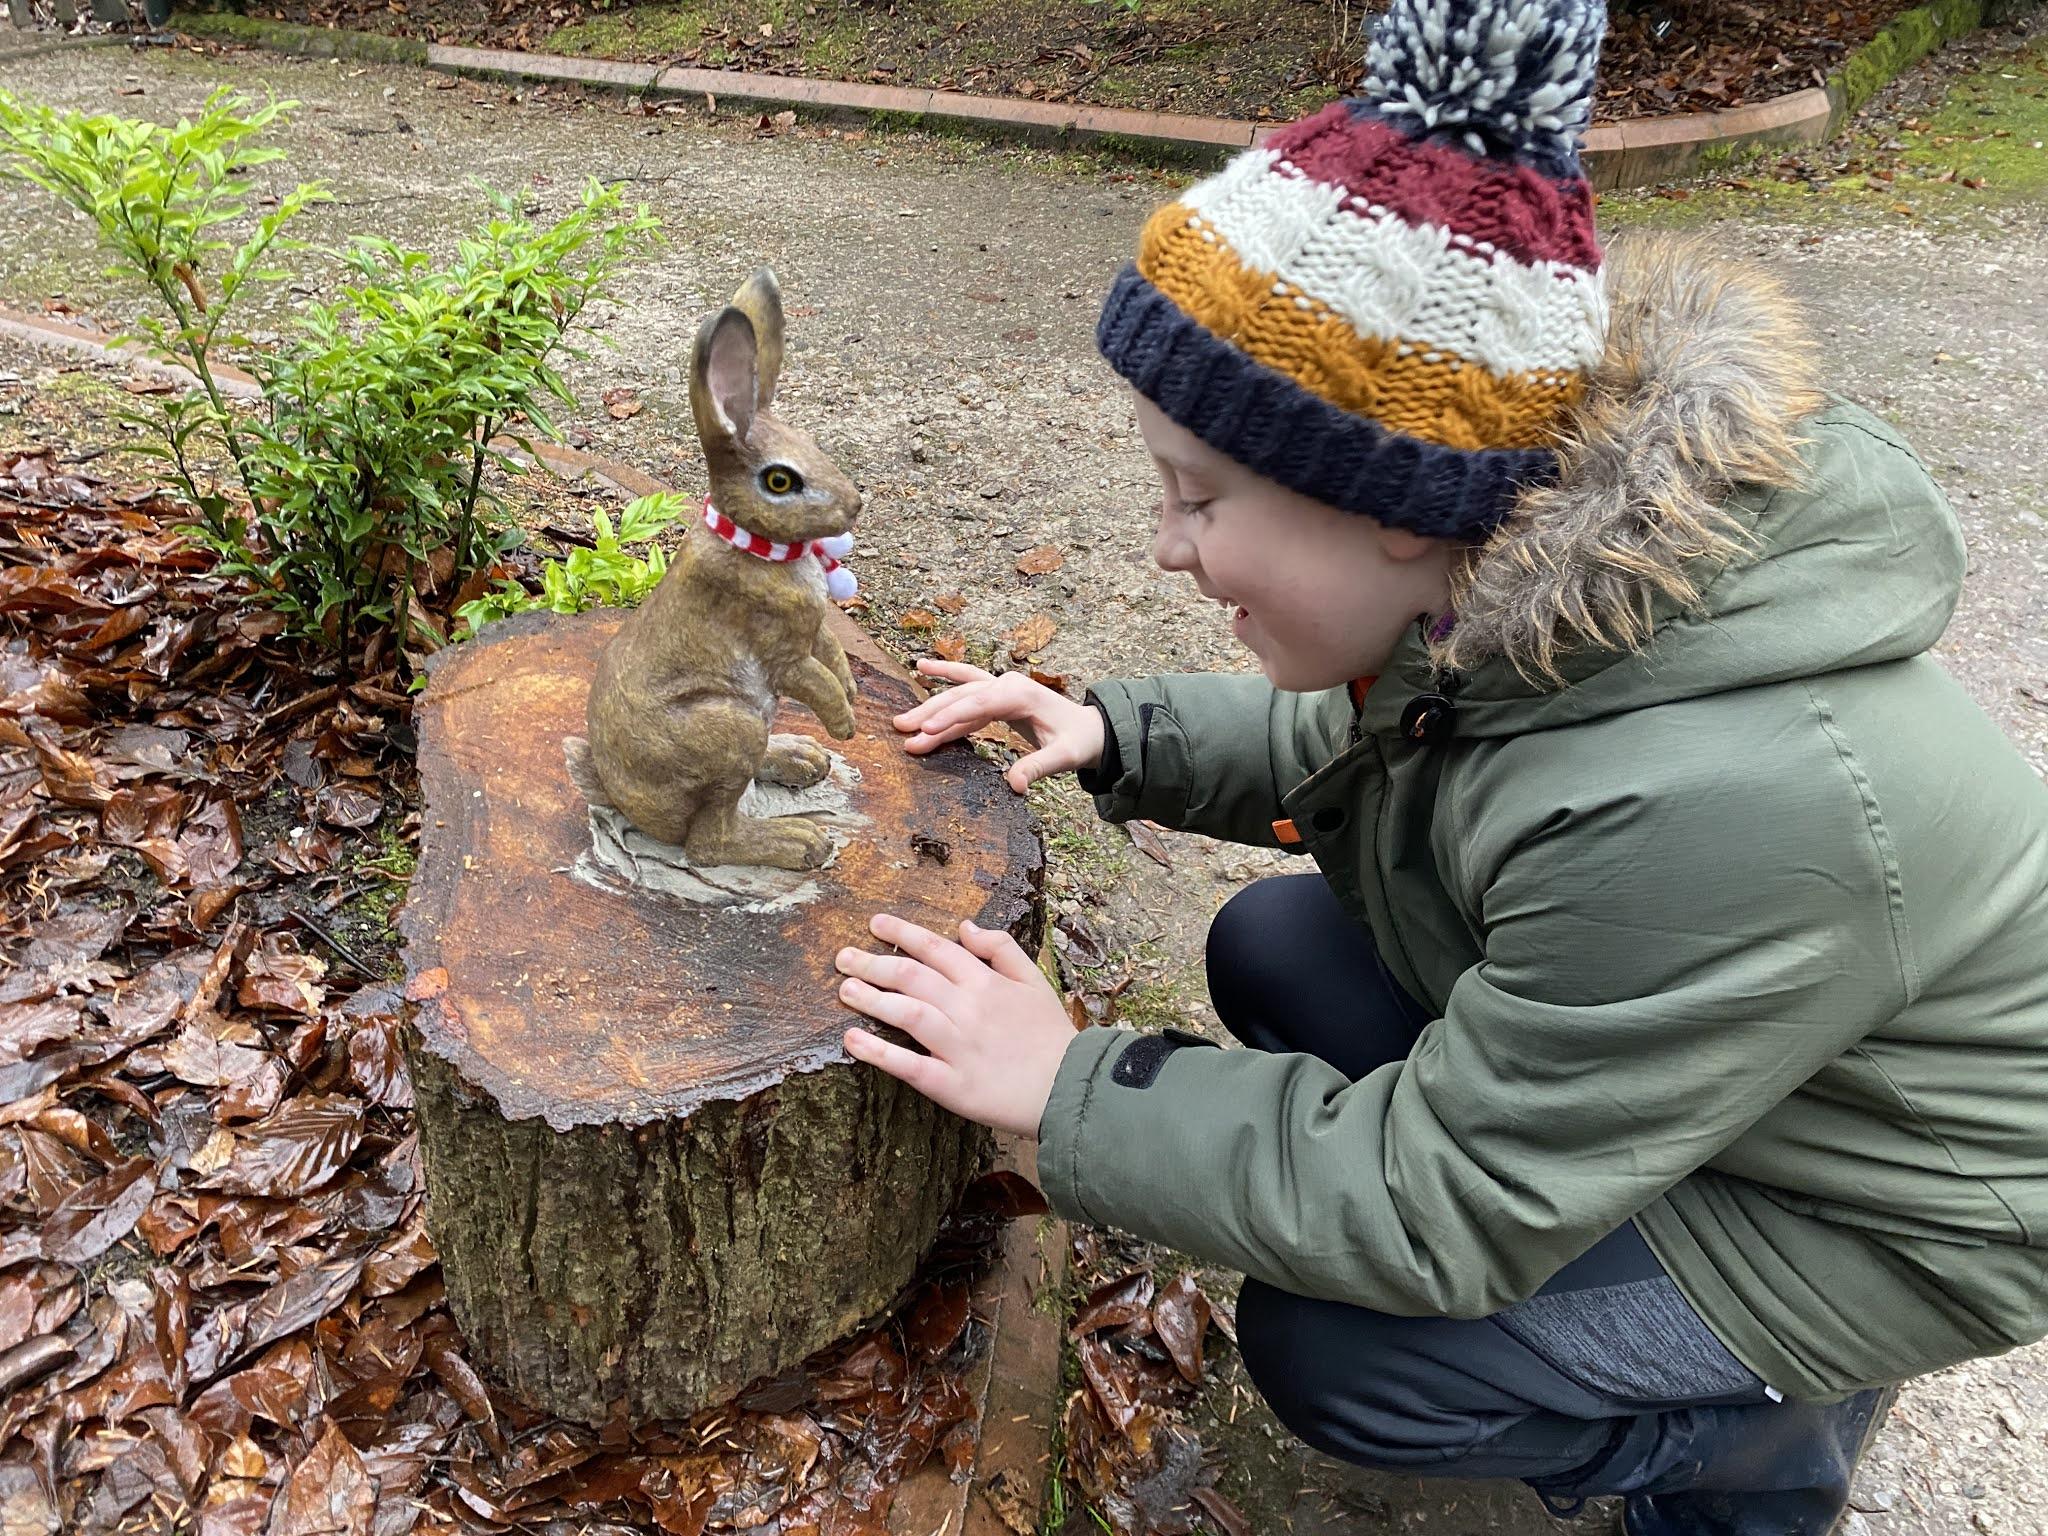 boy with rabbit statue